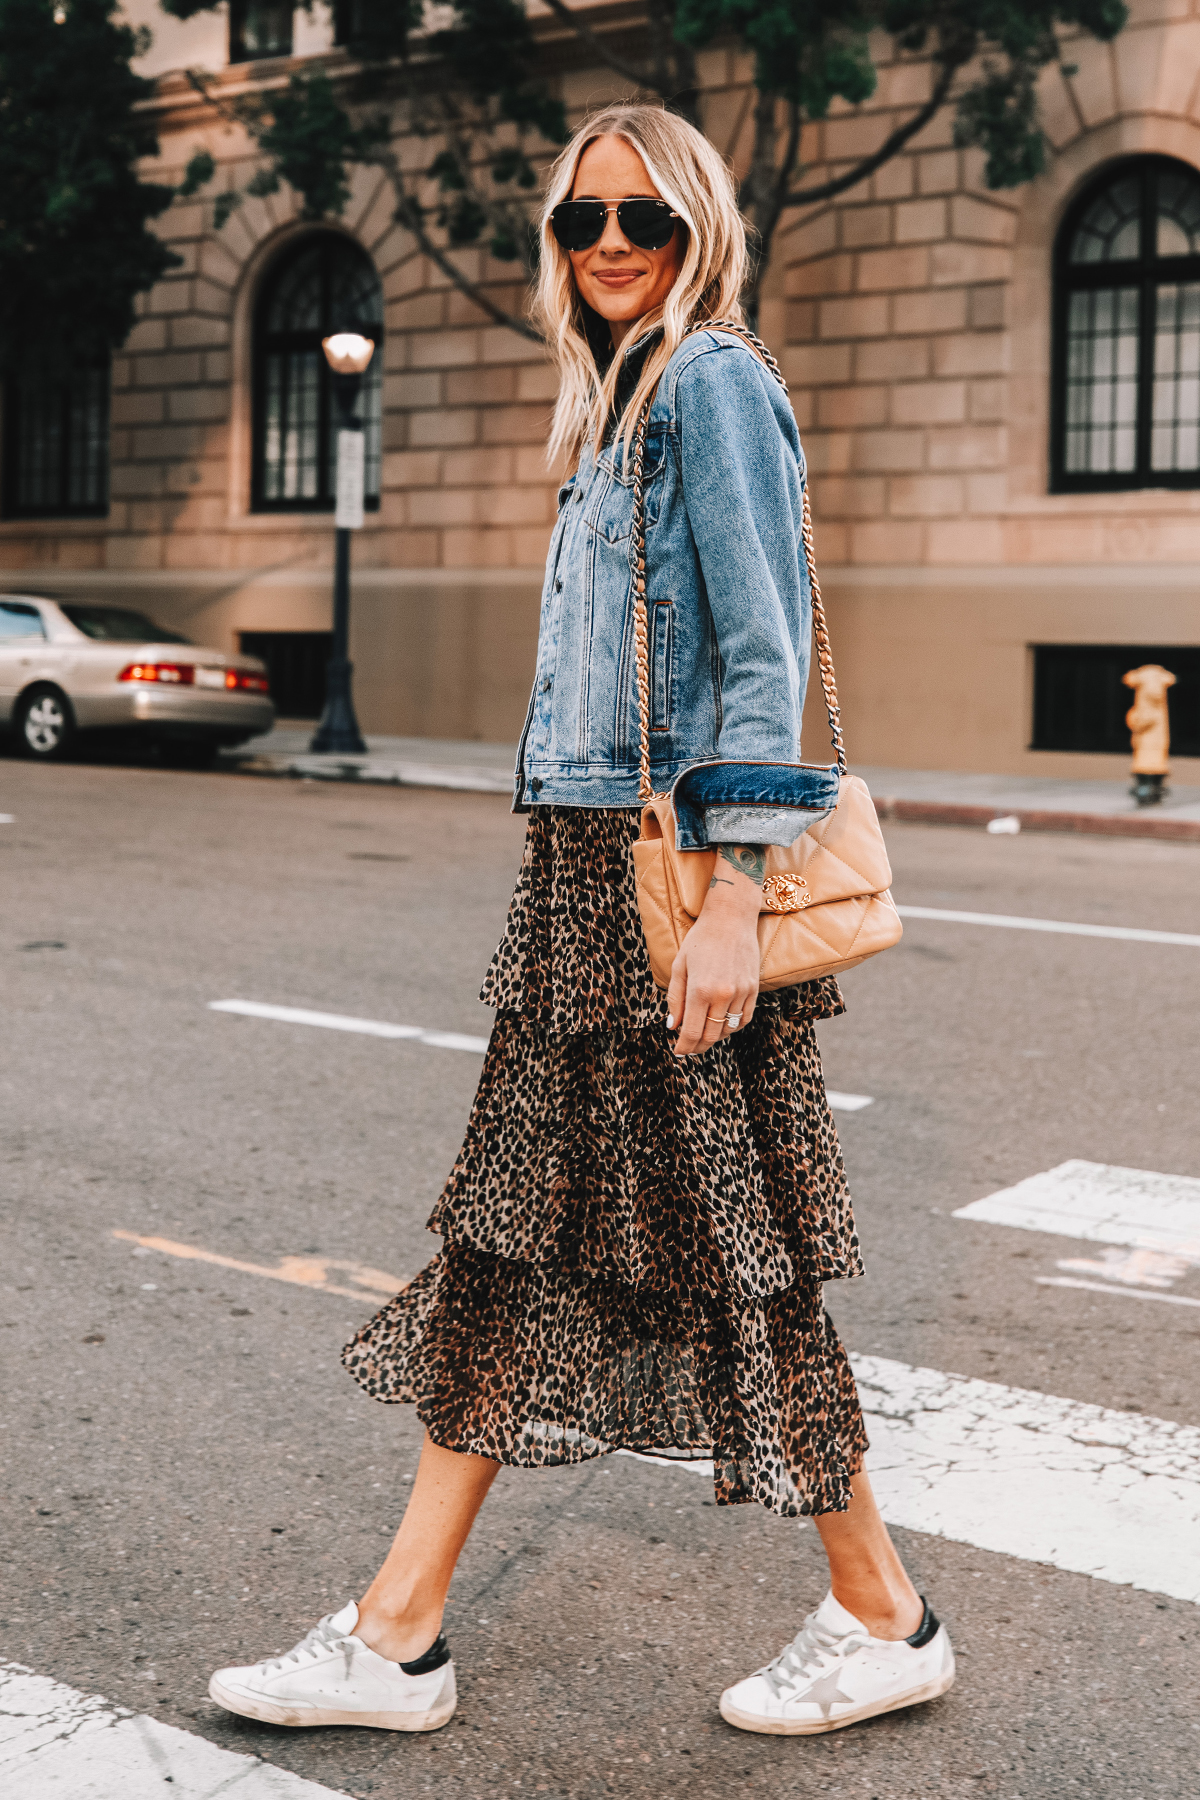 Fashion Jackson Wearing Denim Jacket Topshop Leopard Tiered Midi Skirt Golden Goose Sneakers Chanel 19 Handbag